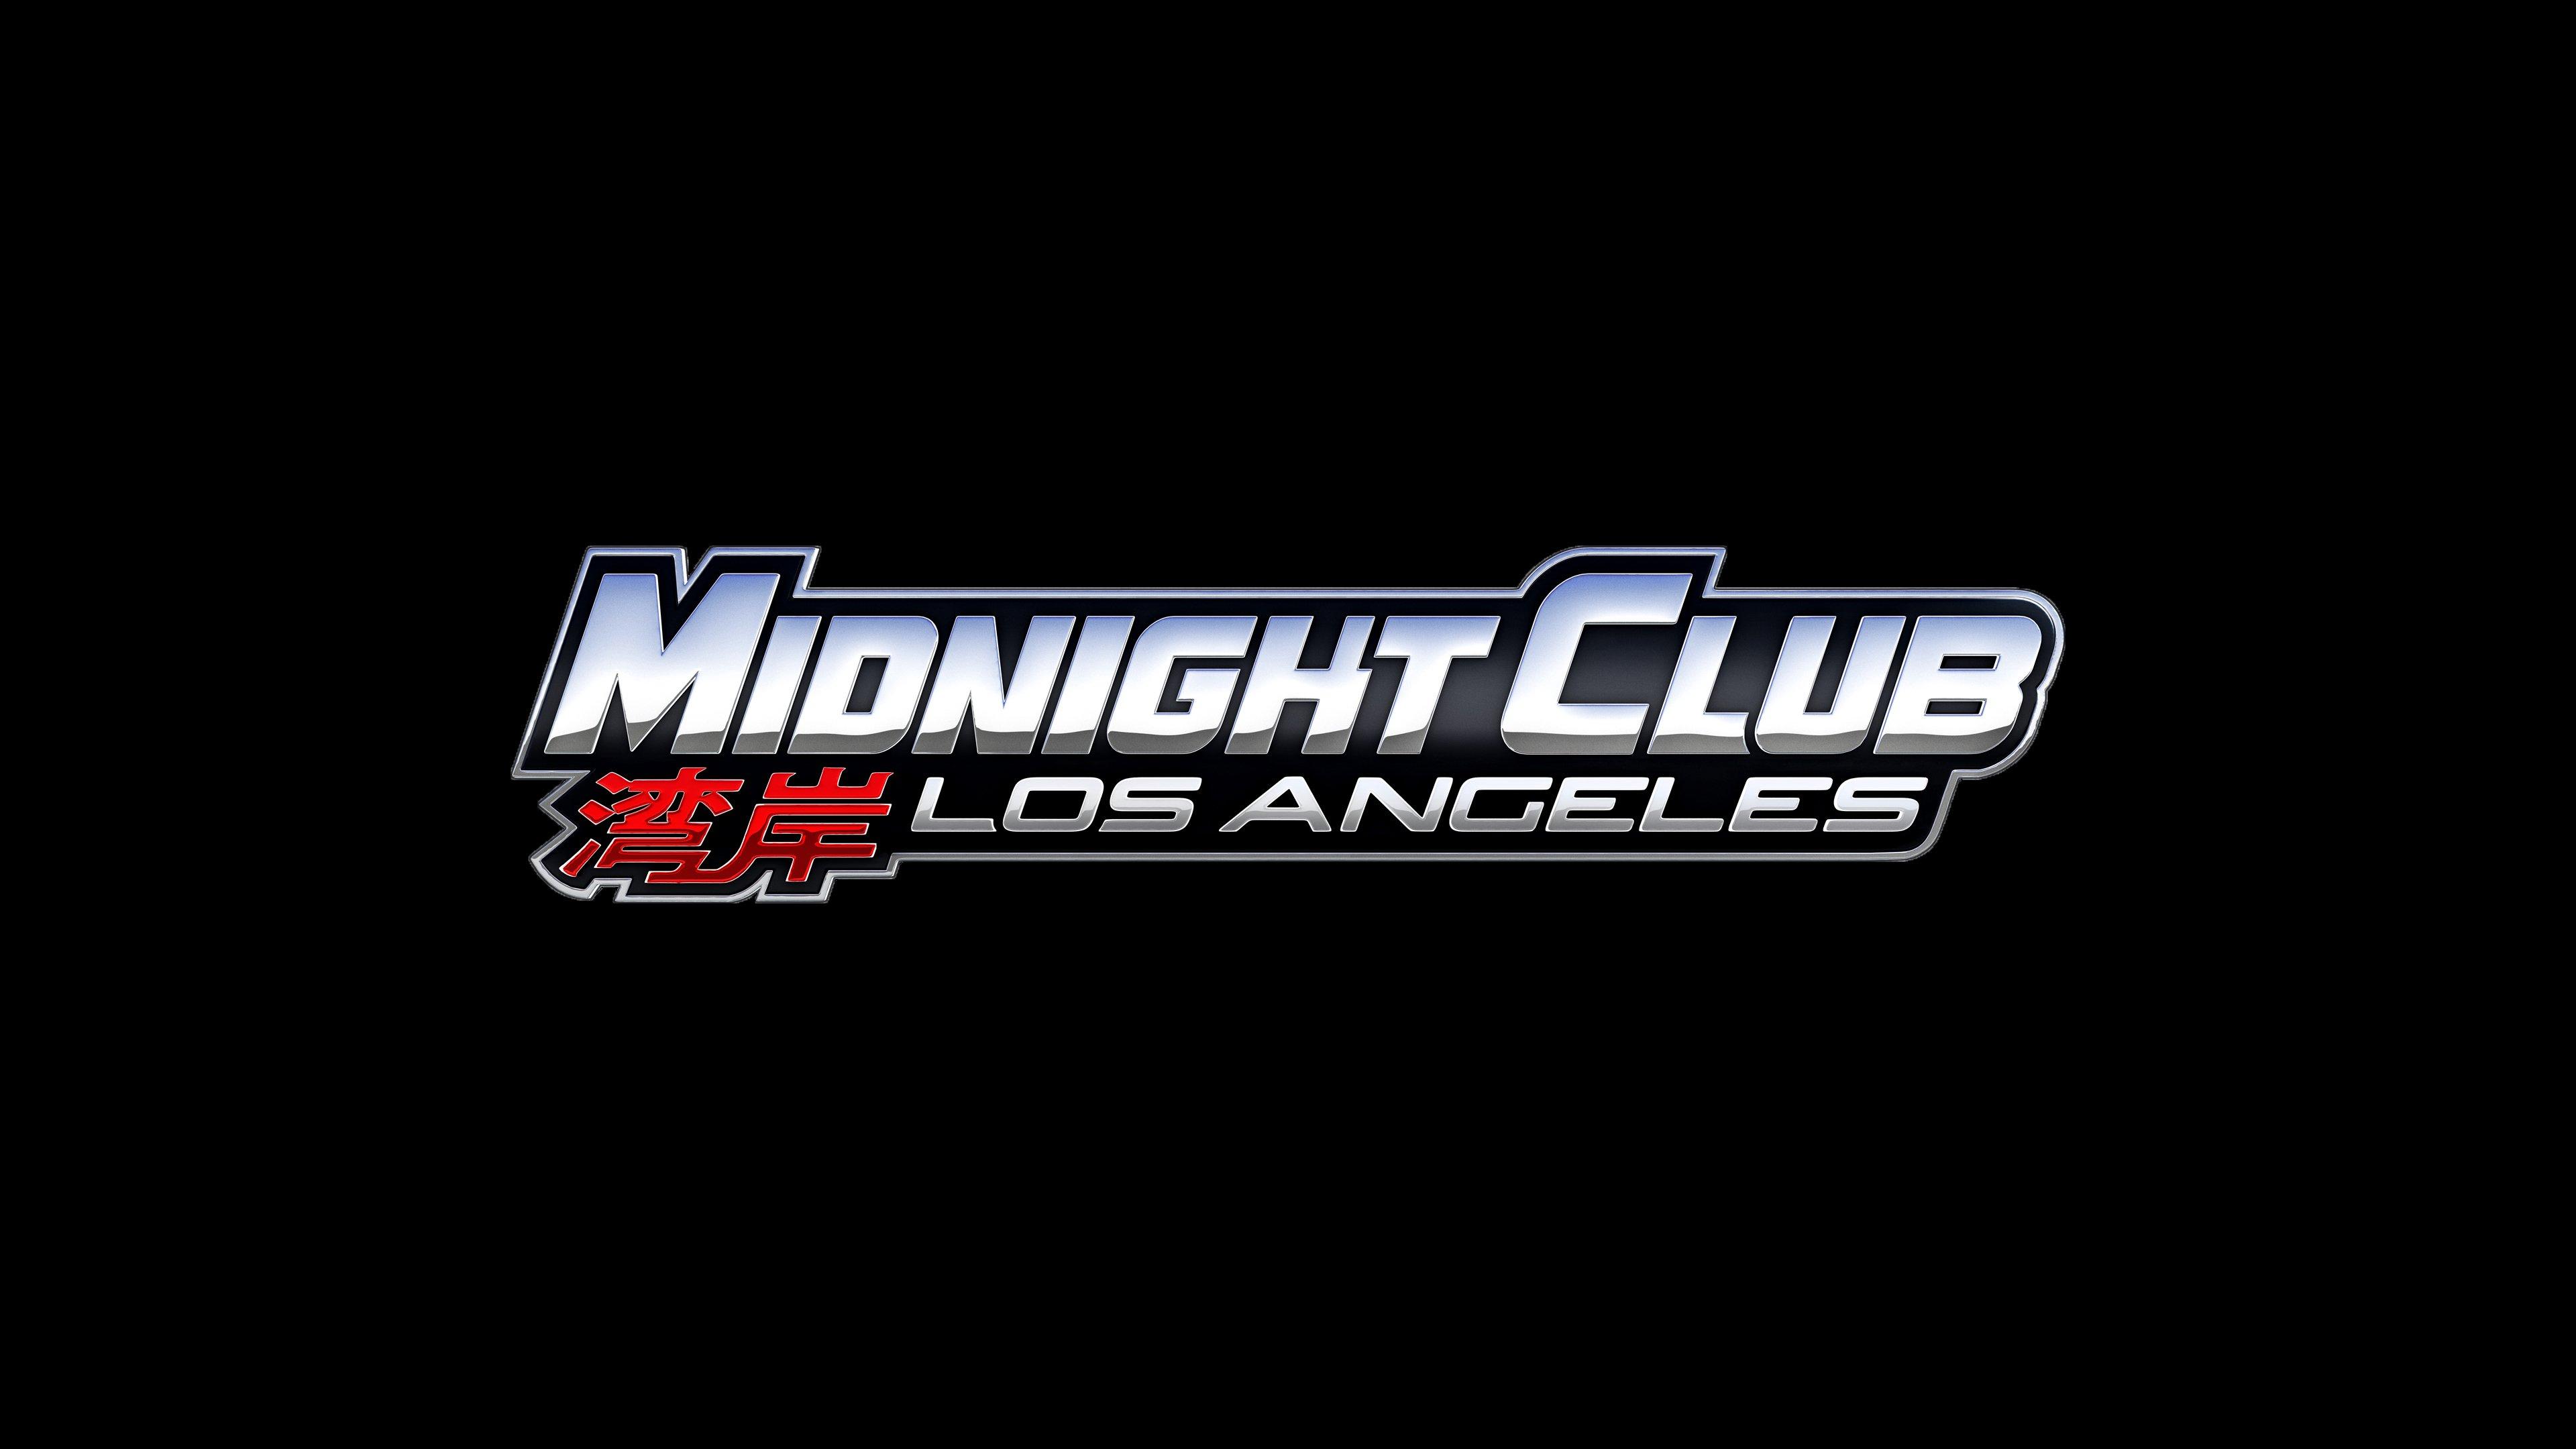 Fondos de pantalla Midnight Club Logo